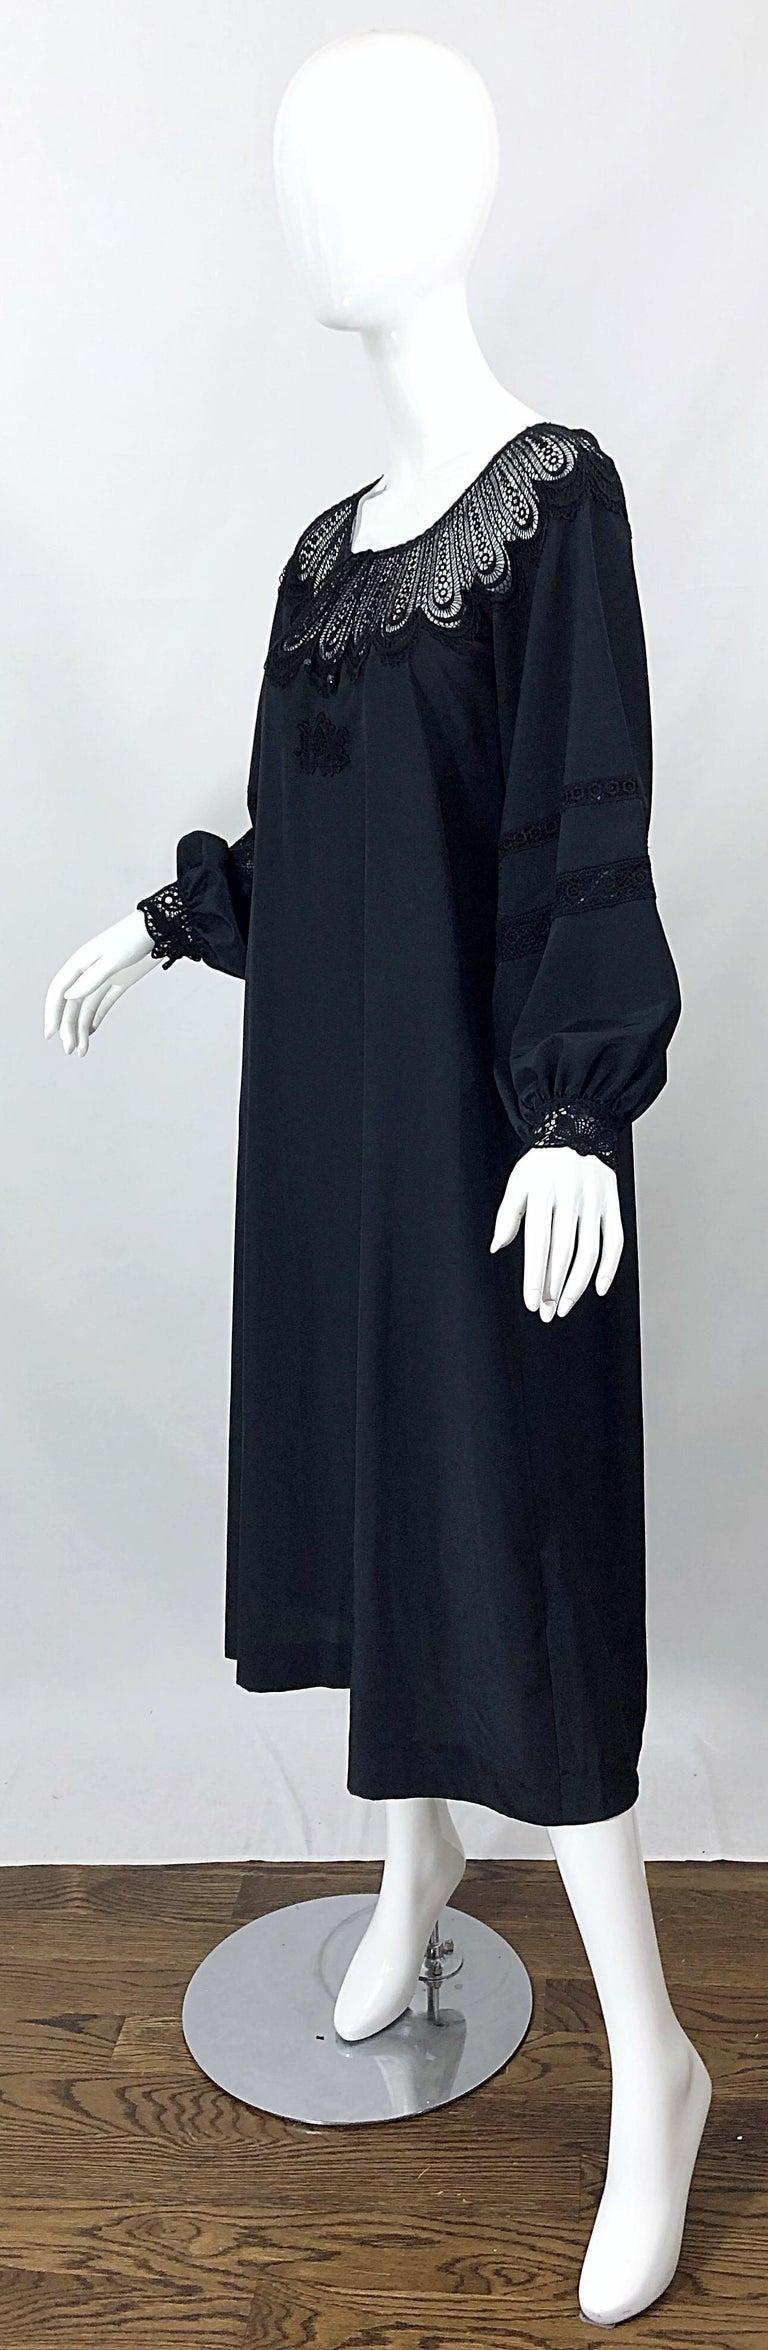 1970s Giorgio di Sant Angelo Black Vintage 70s Crochet Bishop Sleeve Smock Dress For Sale 6